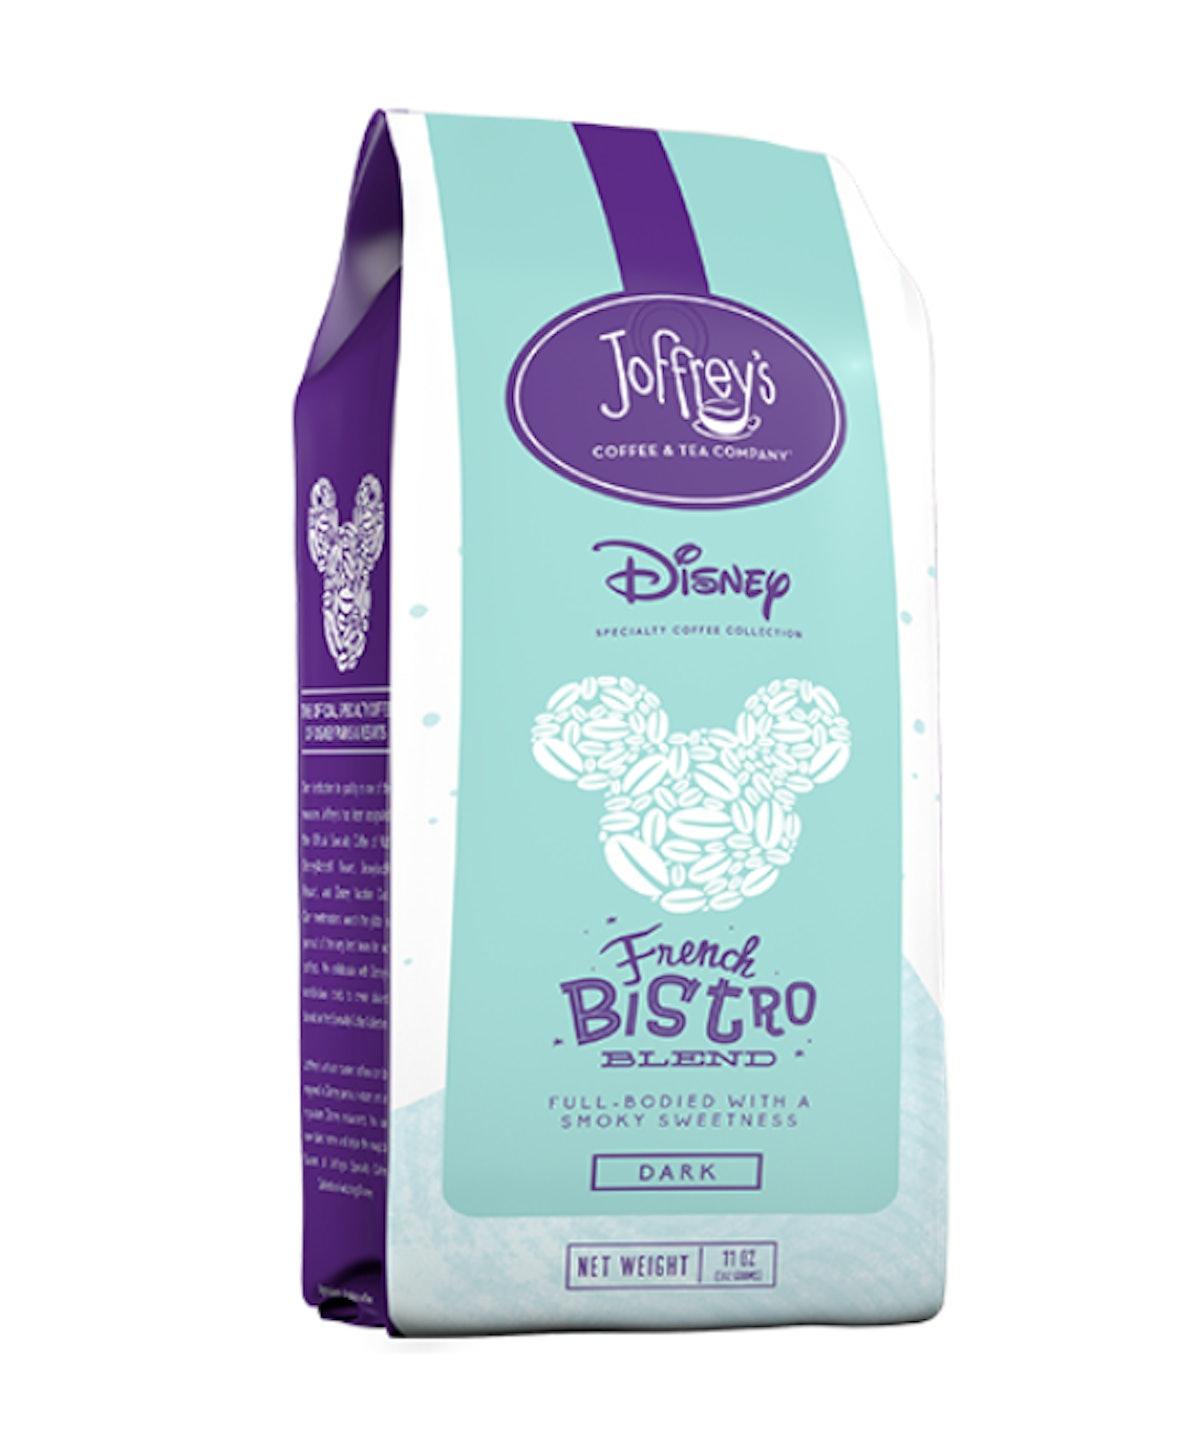 Joffrey's Disney French Bistro Coffee Subscription Service